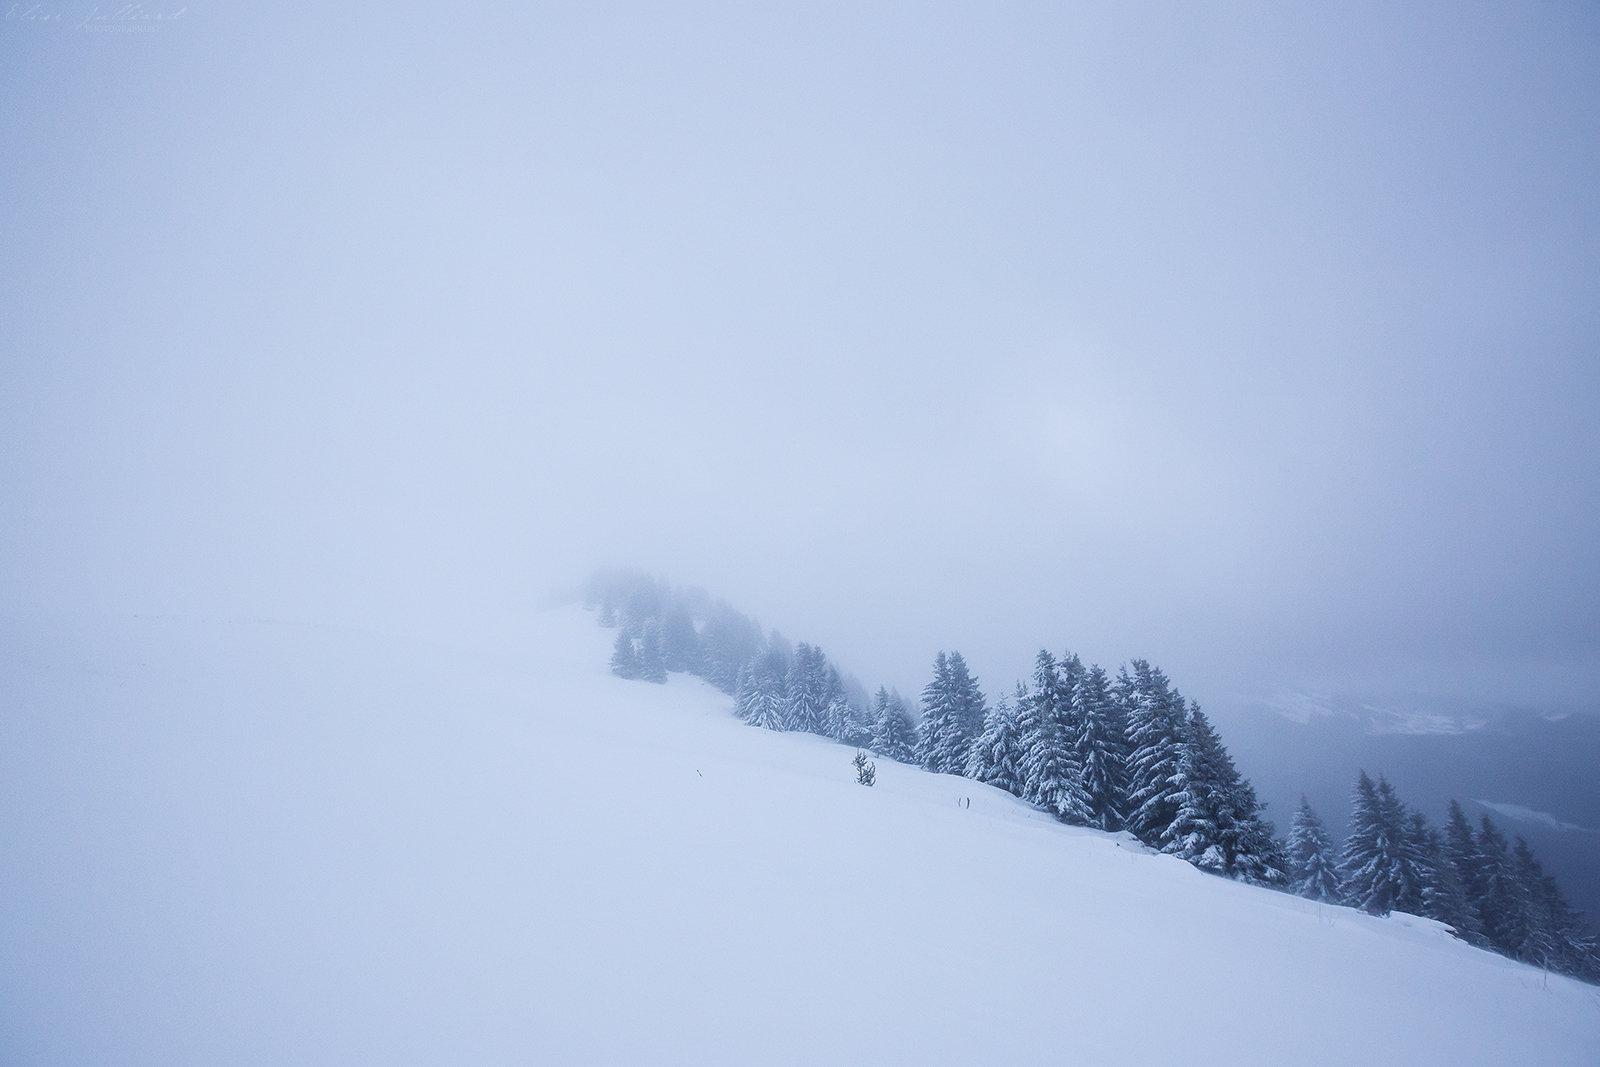 elise-julliard-photographe-photo-paysage-aravis-massif-des-bornes-haute-savoie-neige